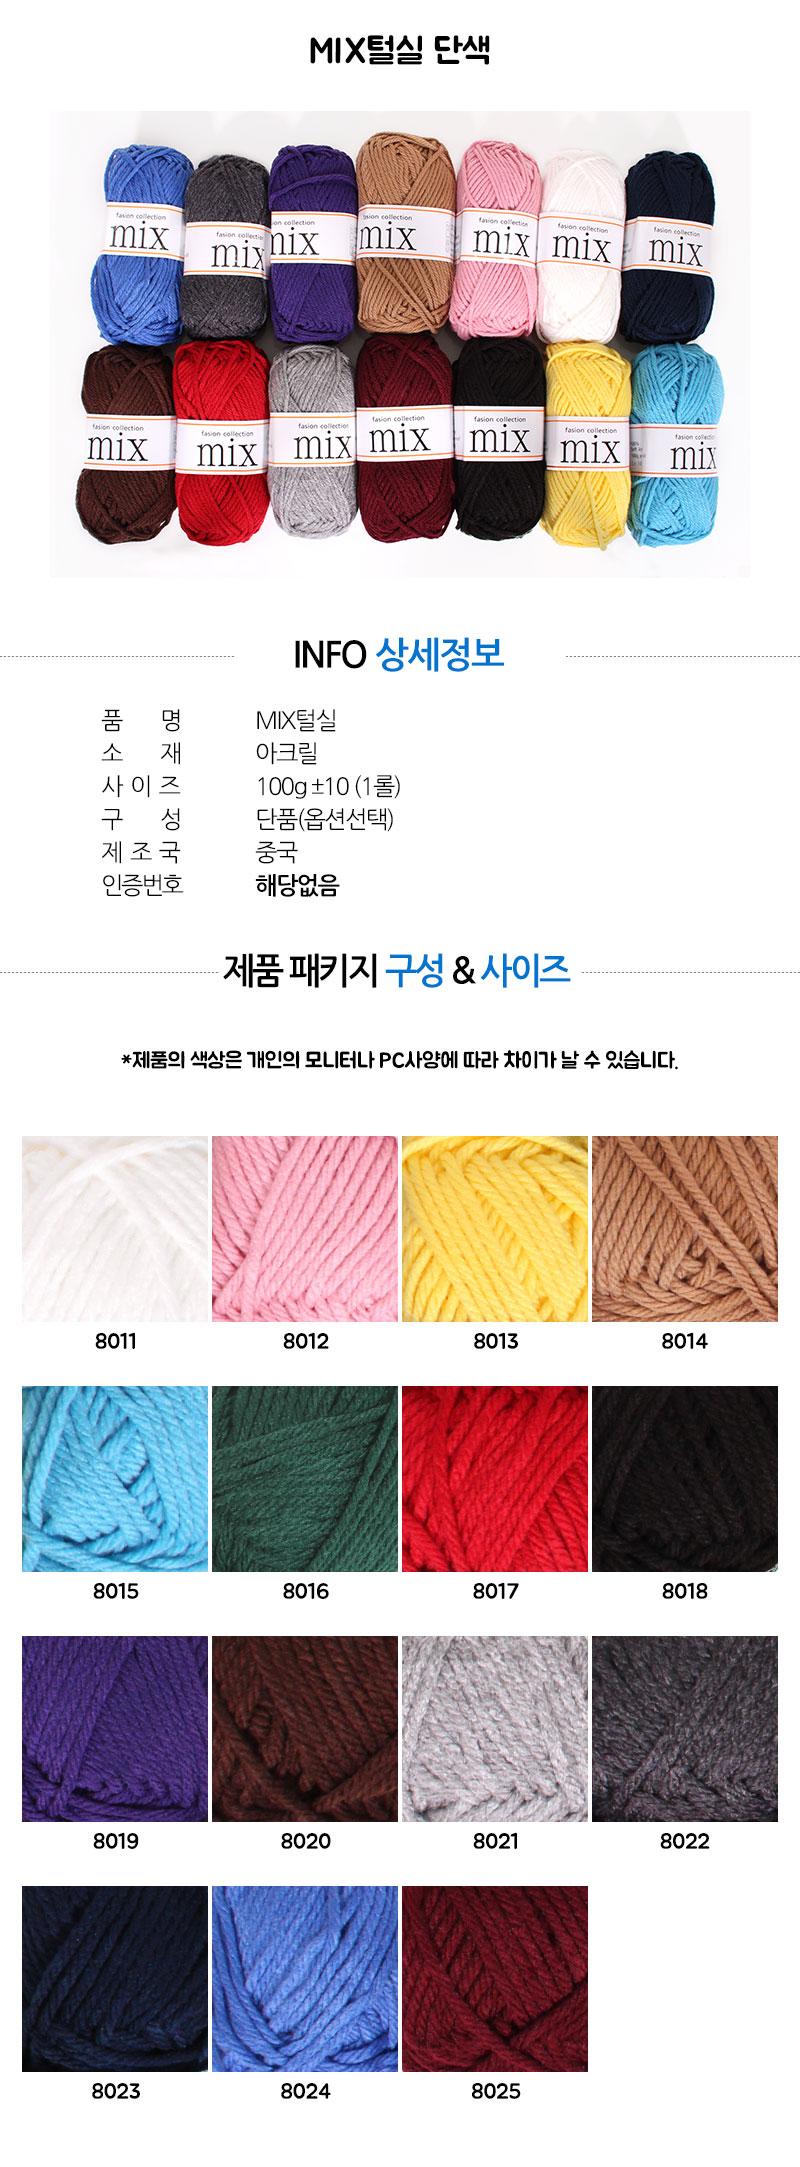 mix털실(낱개) - 킹콩박스, 5,000원, 뜨개질, 가을/겨울용 뜨개실